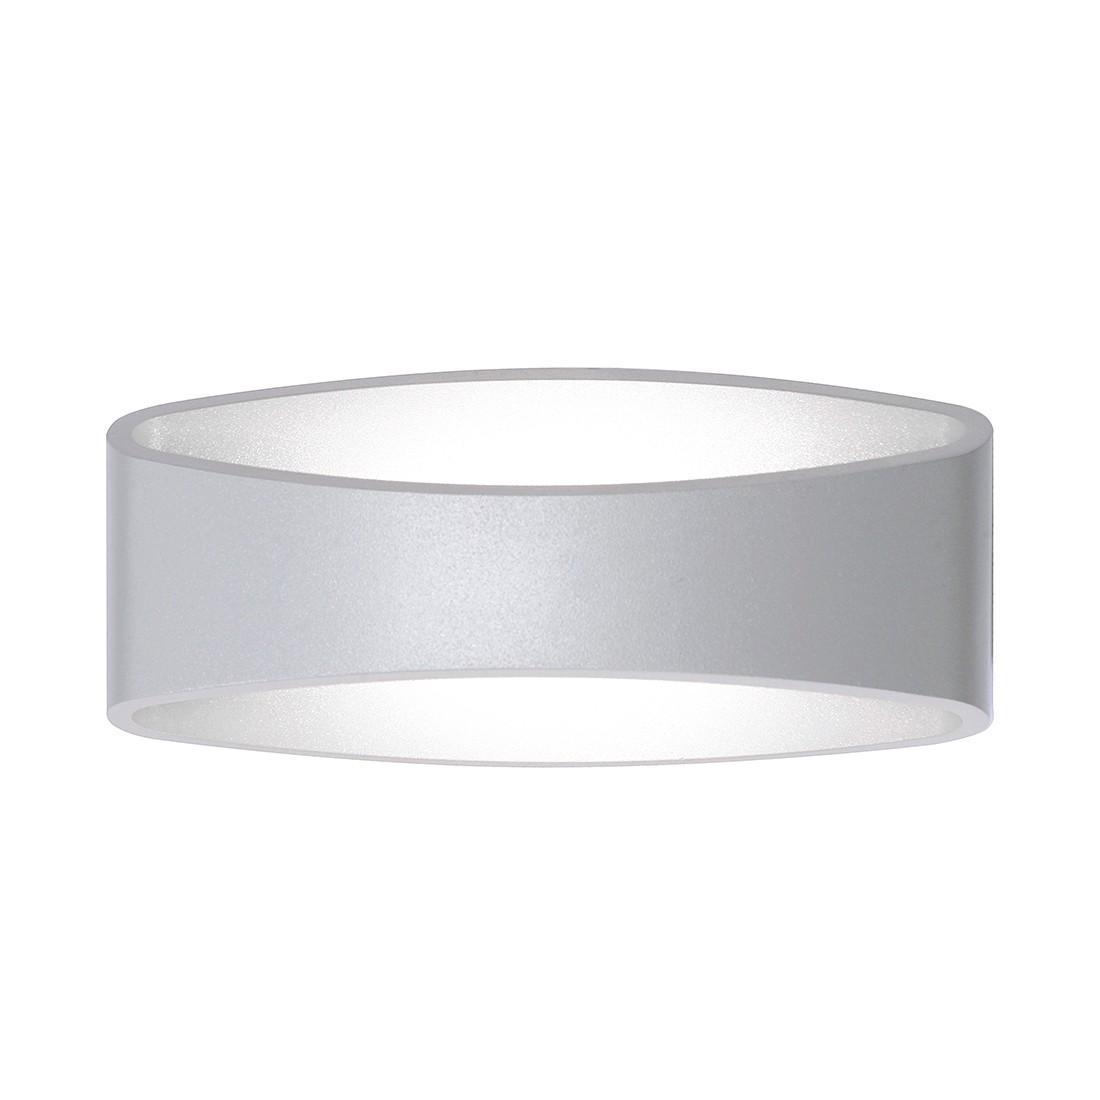 Wandleuchte Holldorf – Aluminium – 1-flammig, FLI Leuchten kaufen